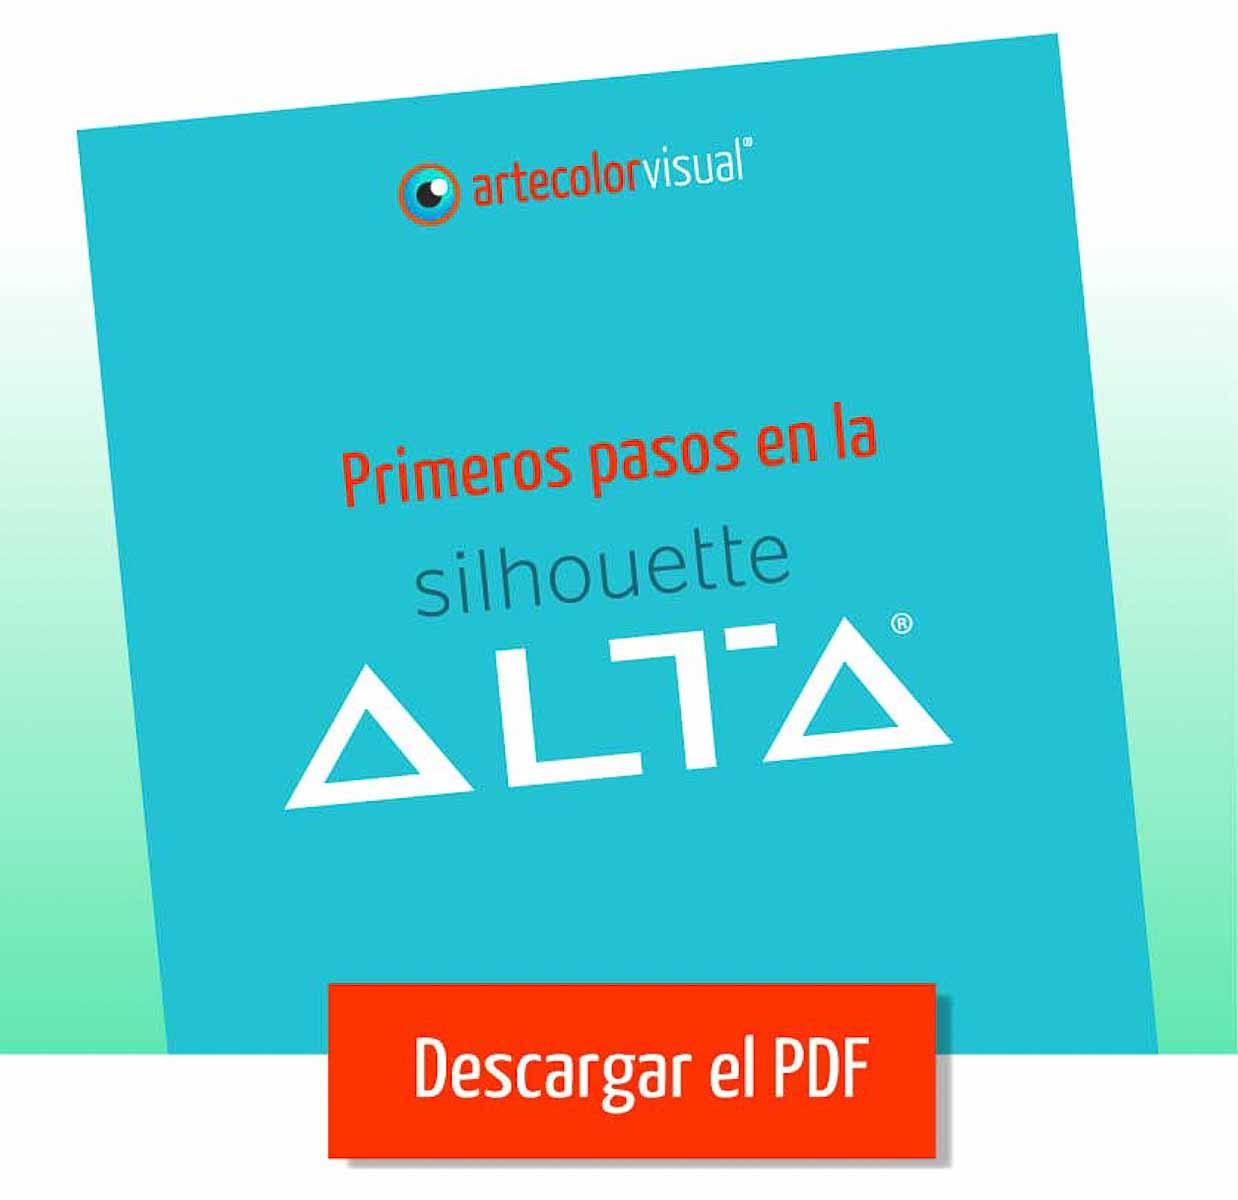 Silhouette Alta | Primeros pasos | ArtecolorVisual